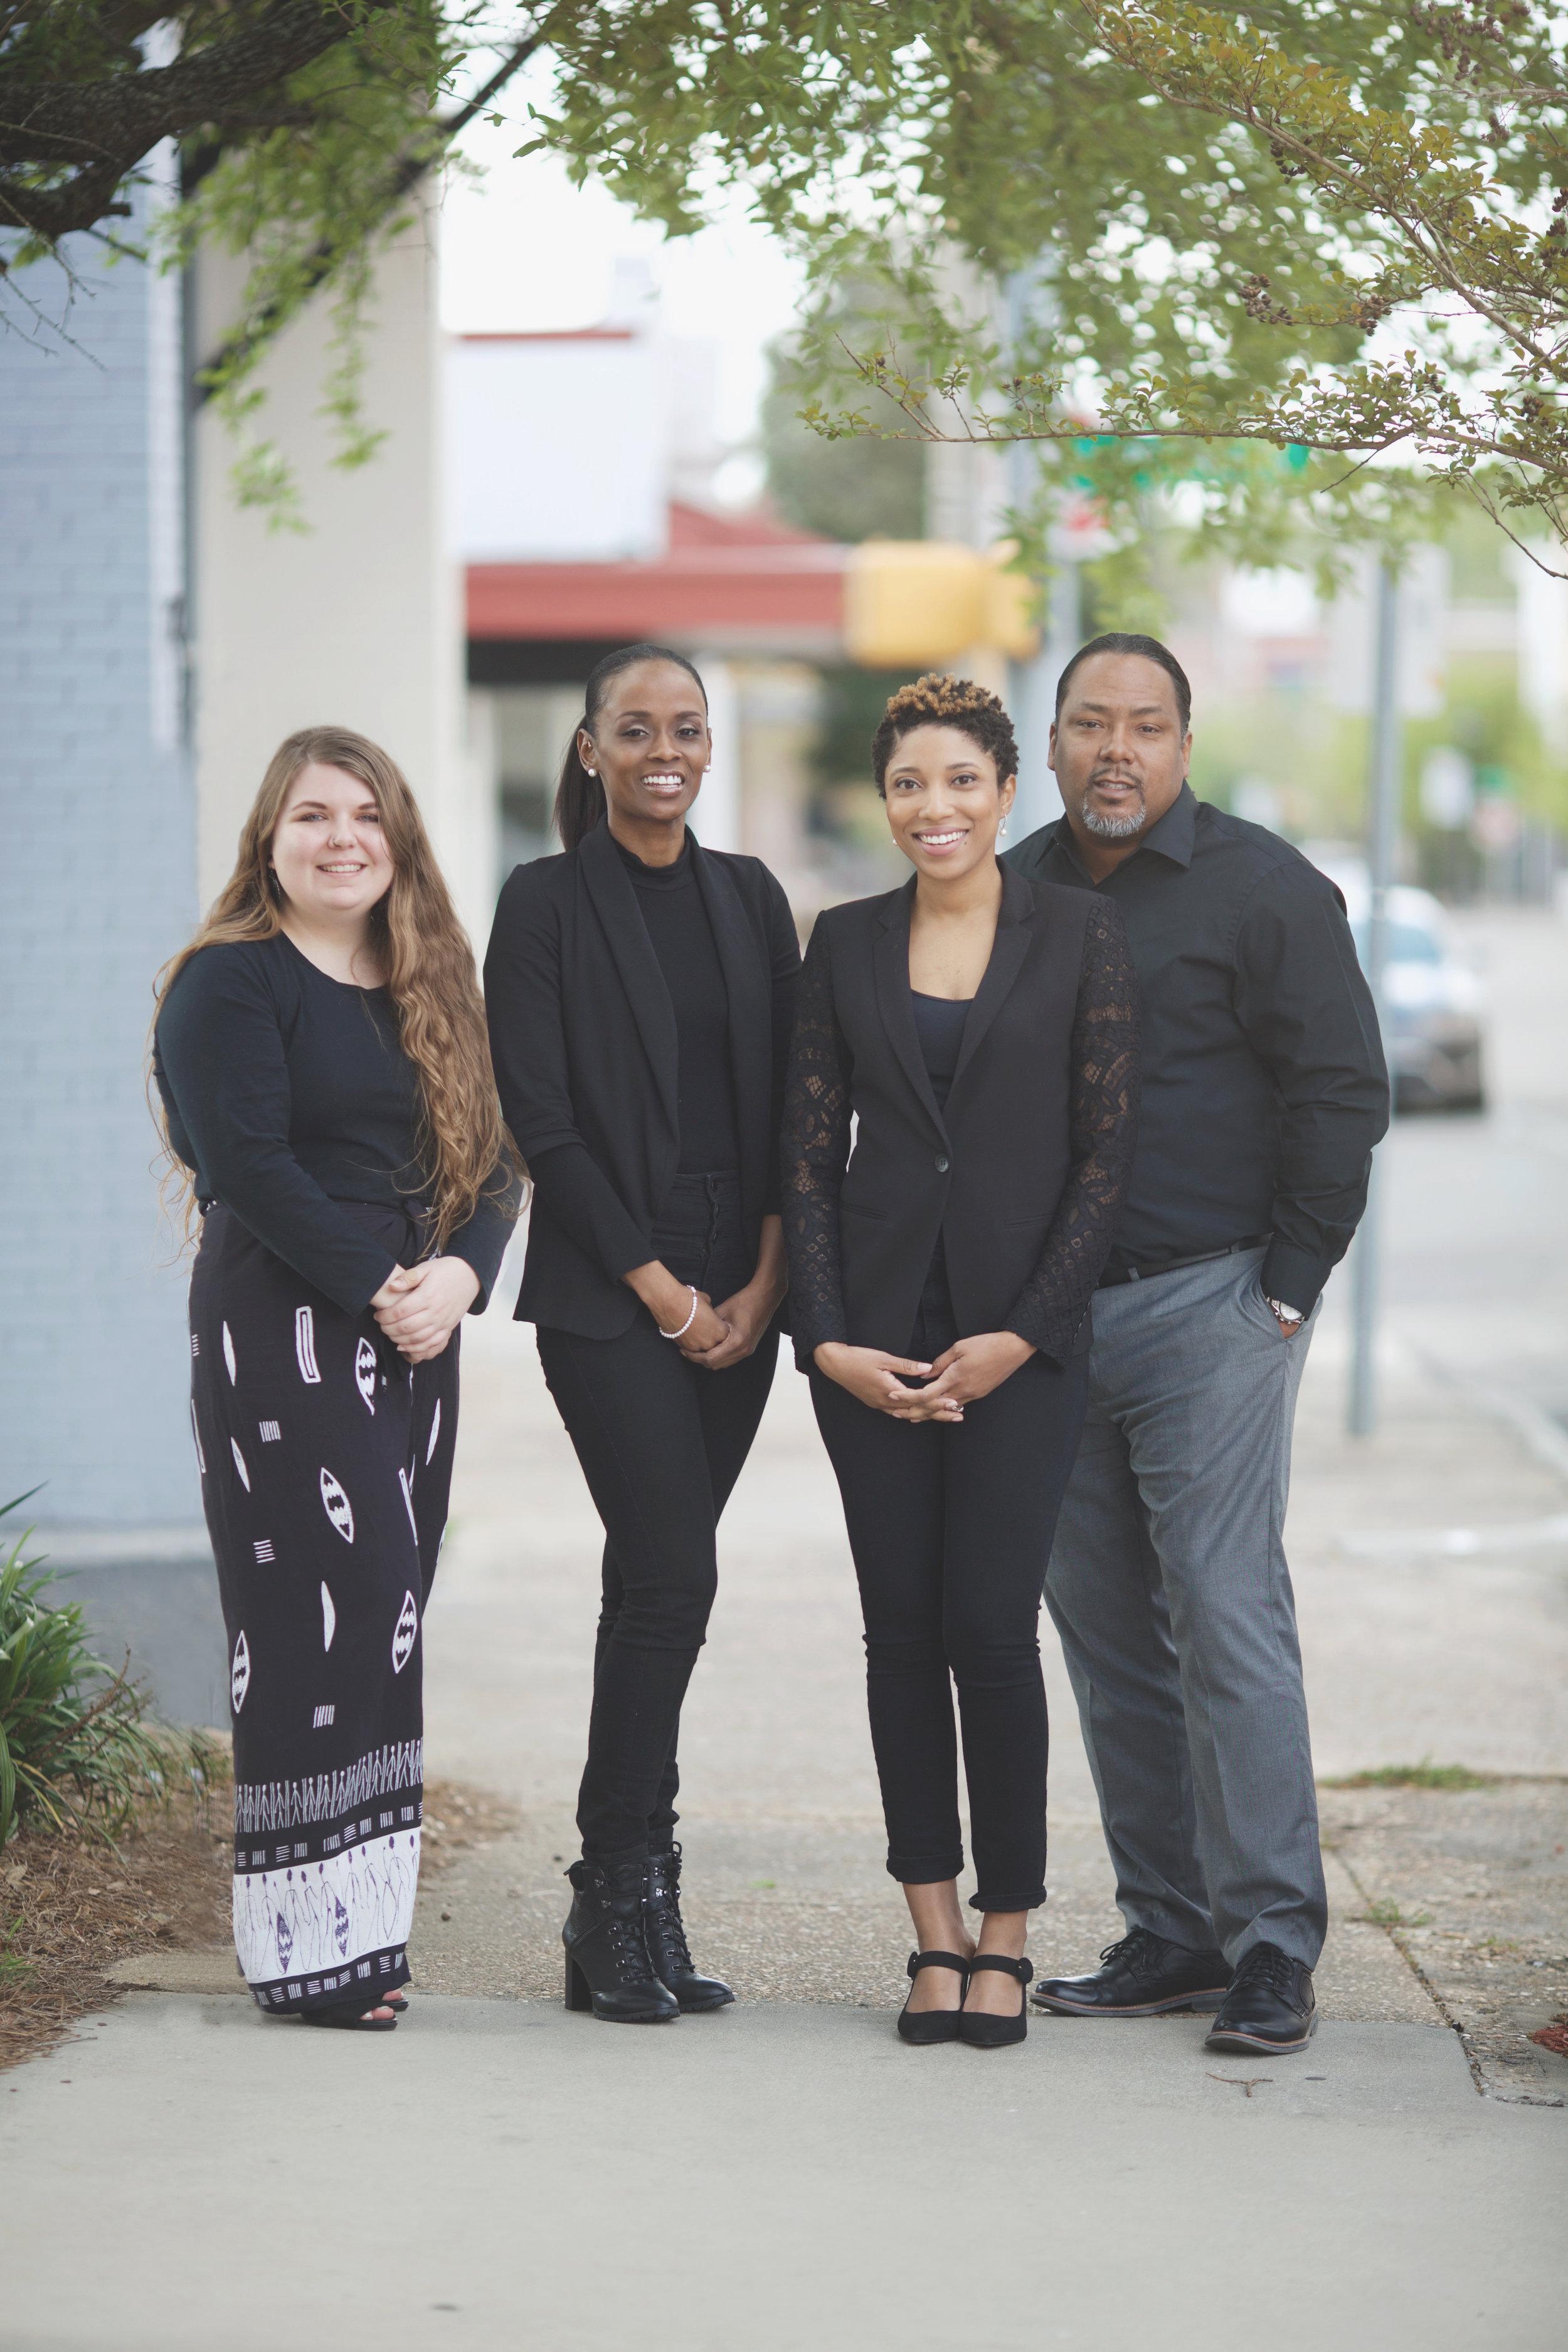 Full-Time Management Team (L-R):   Destiny Hosmer (Comm. Manager), Kienda Koonce (Program Manager), Precious Freeman (Executive Director), Biko Freeman (Facilities Manager)